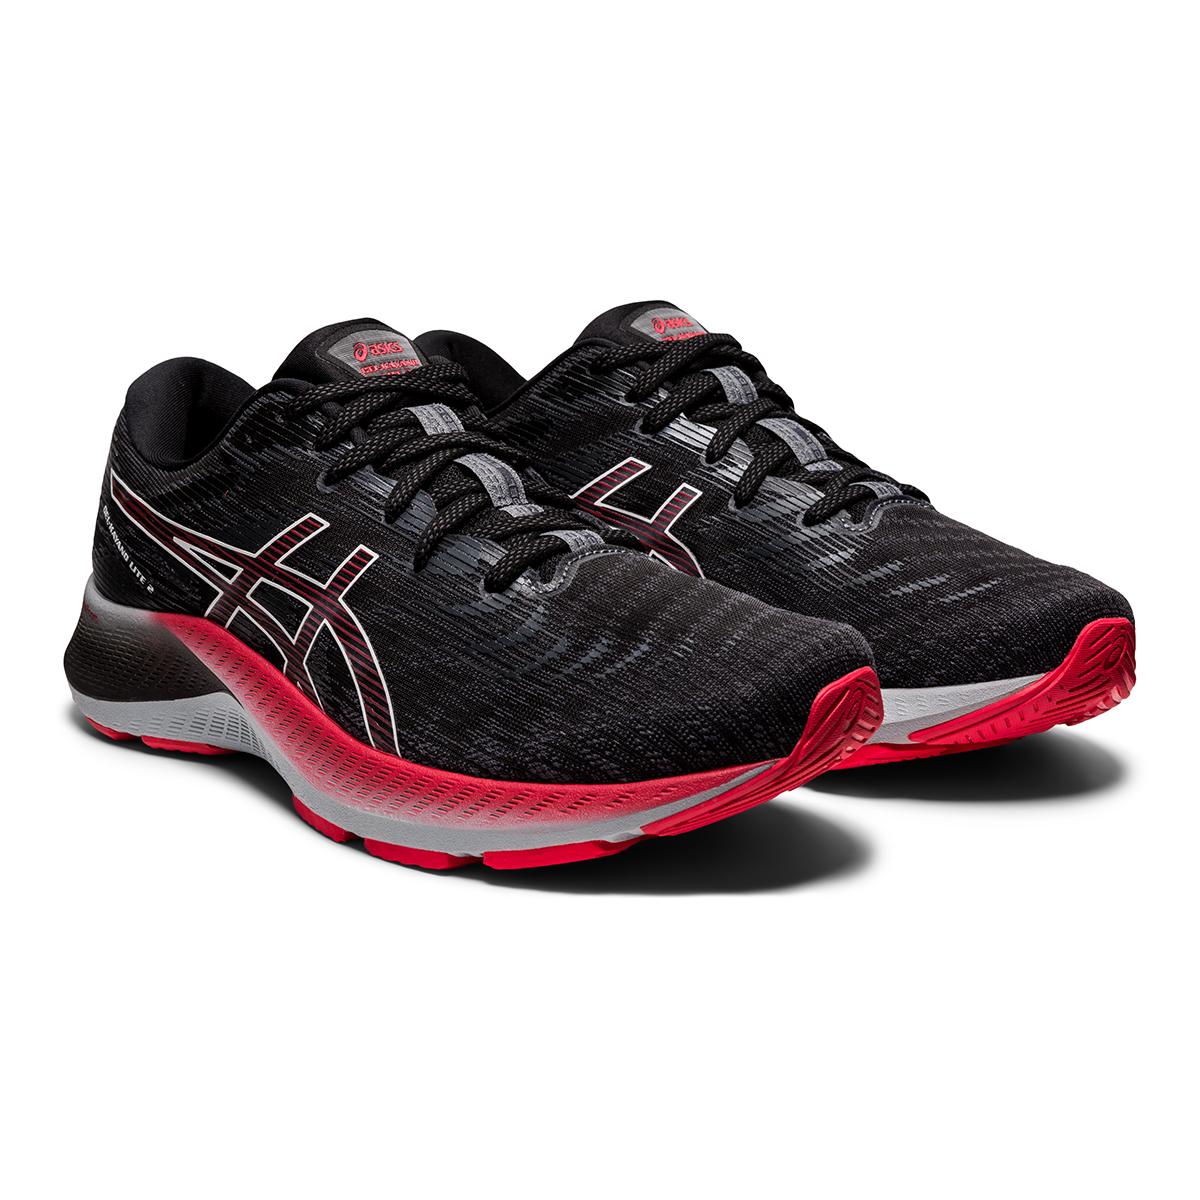 Men's Asics Gel-Kayano Lite 2 Running Shoe - Color: Black/White - Size: 7 - Width: Regular, Black/White, large, image 5